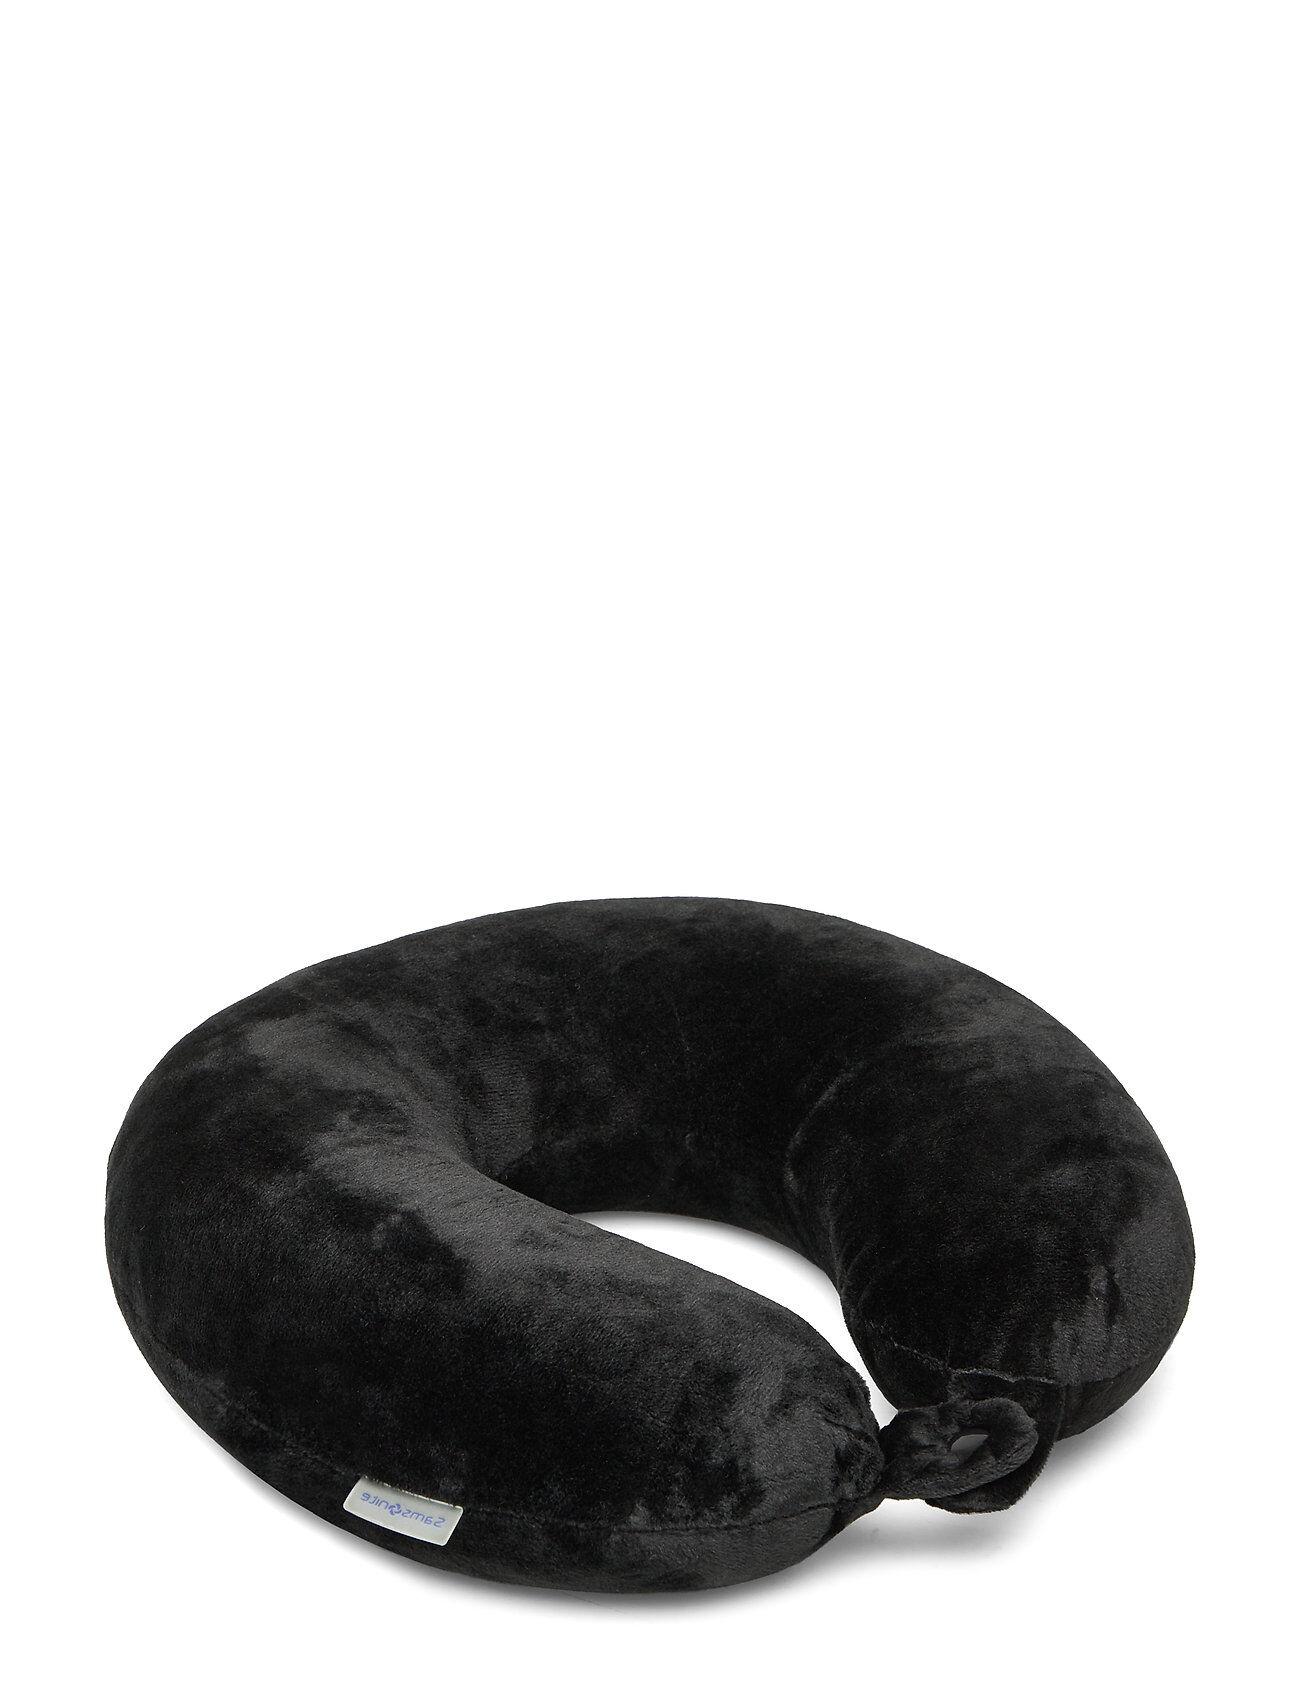 Samsonite Memory Foam Pillow With Pouch Muut Asusteet Musta